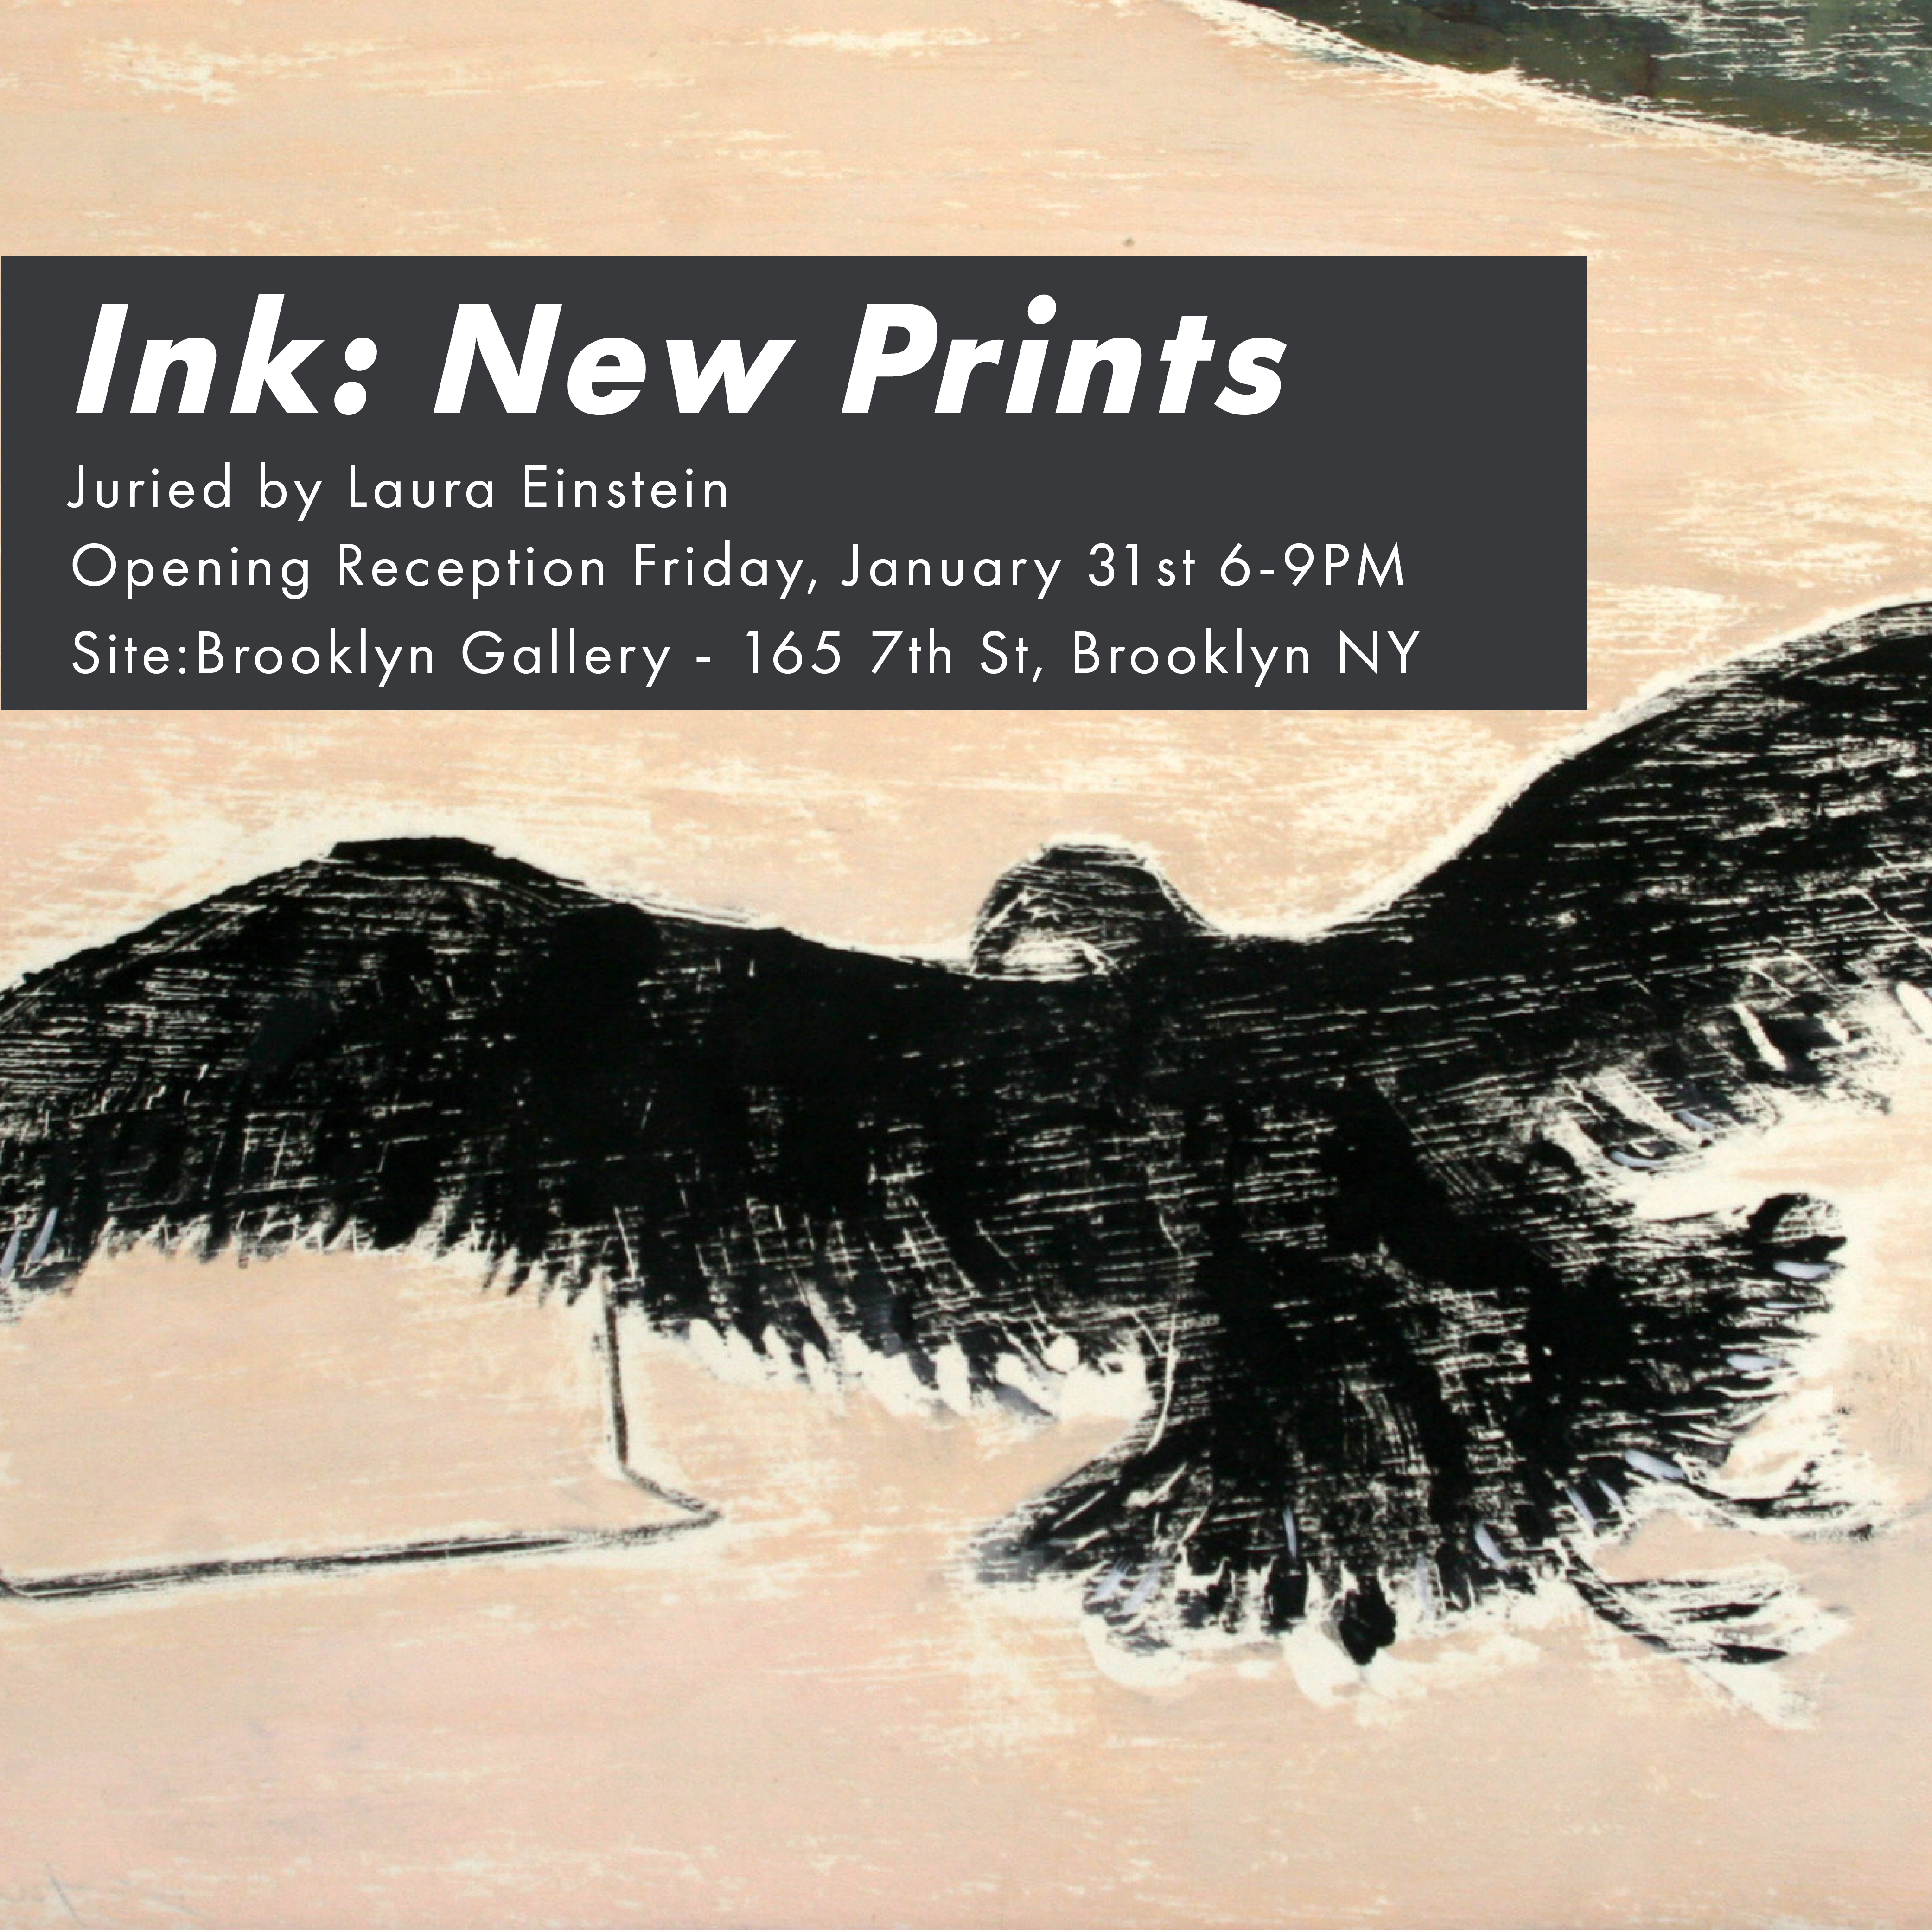 Ink: New Prints